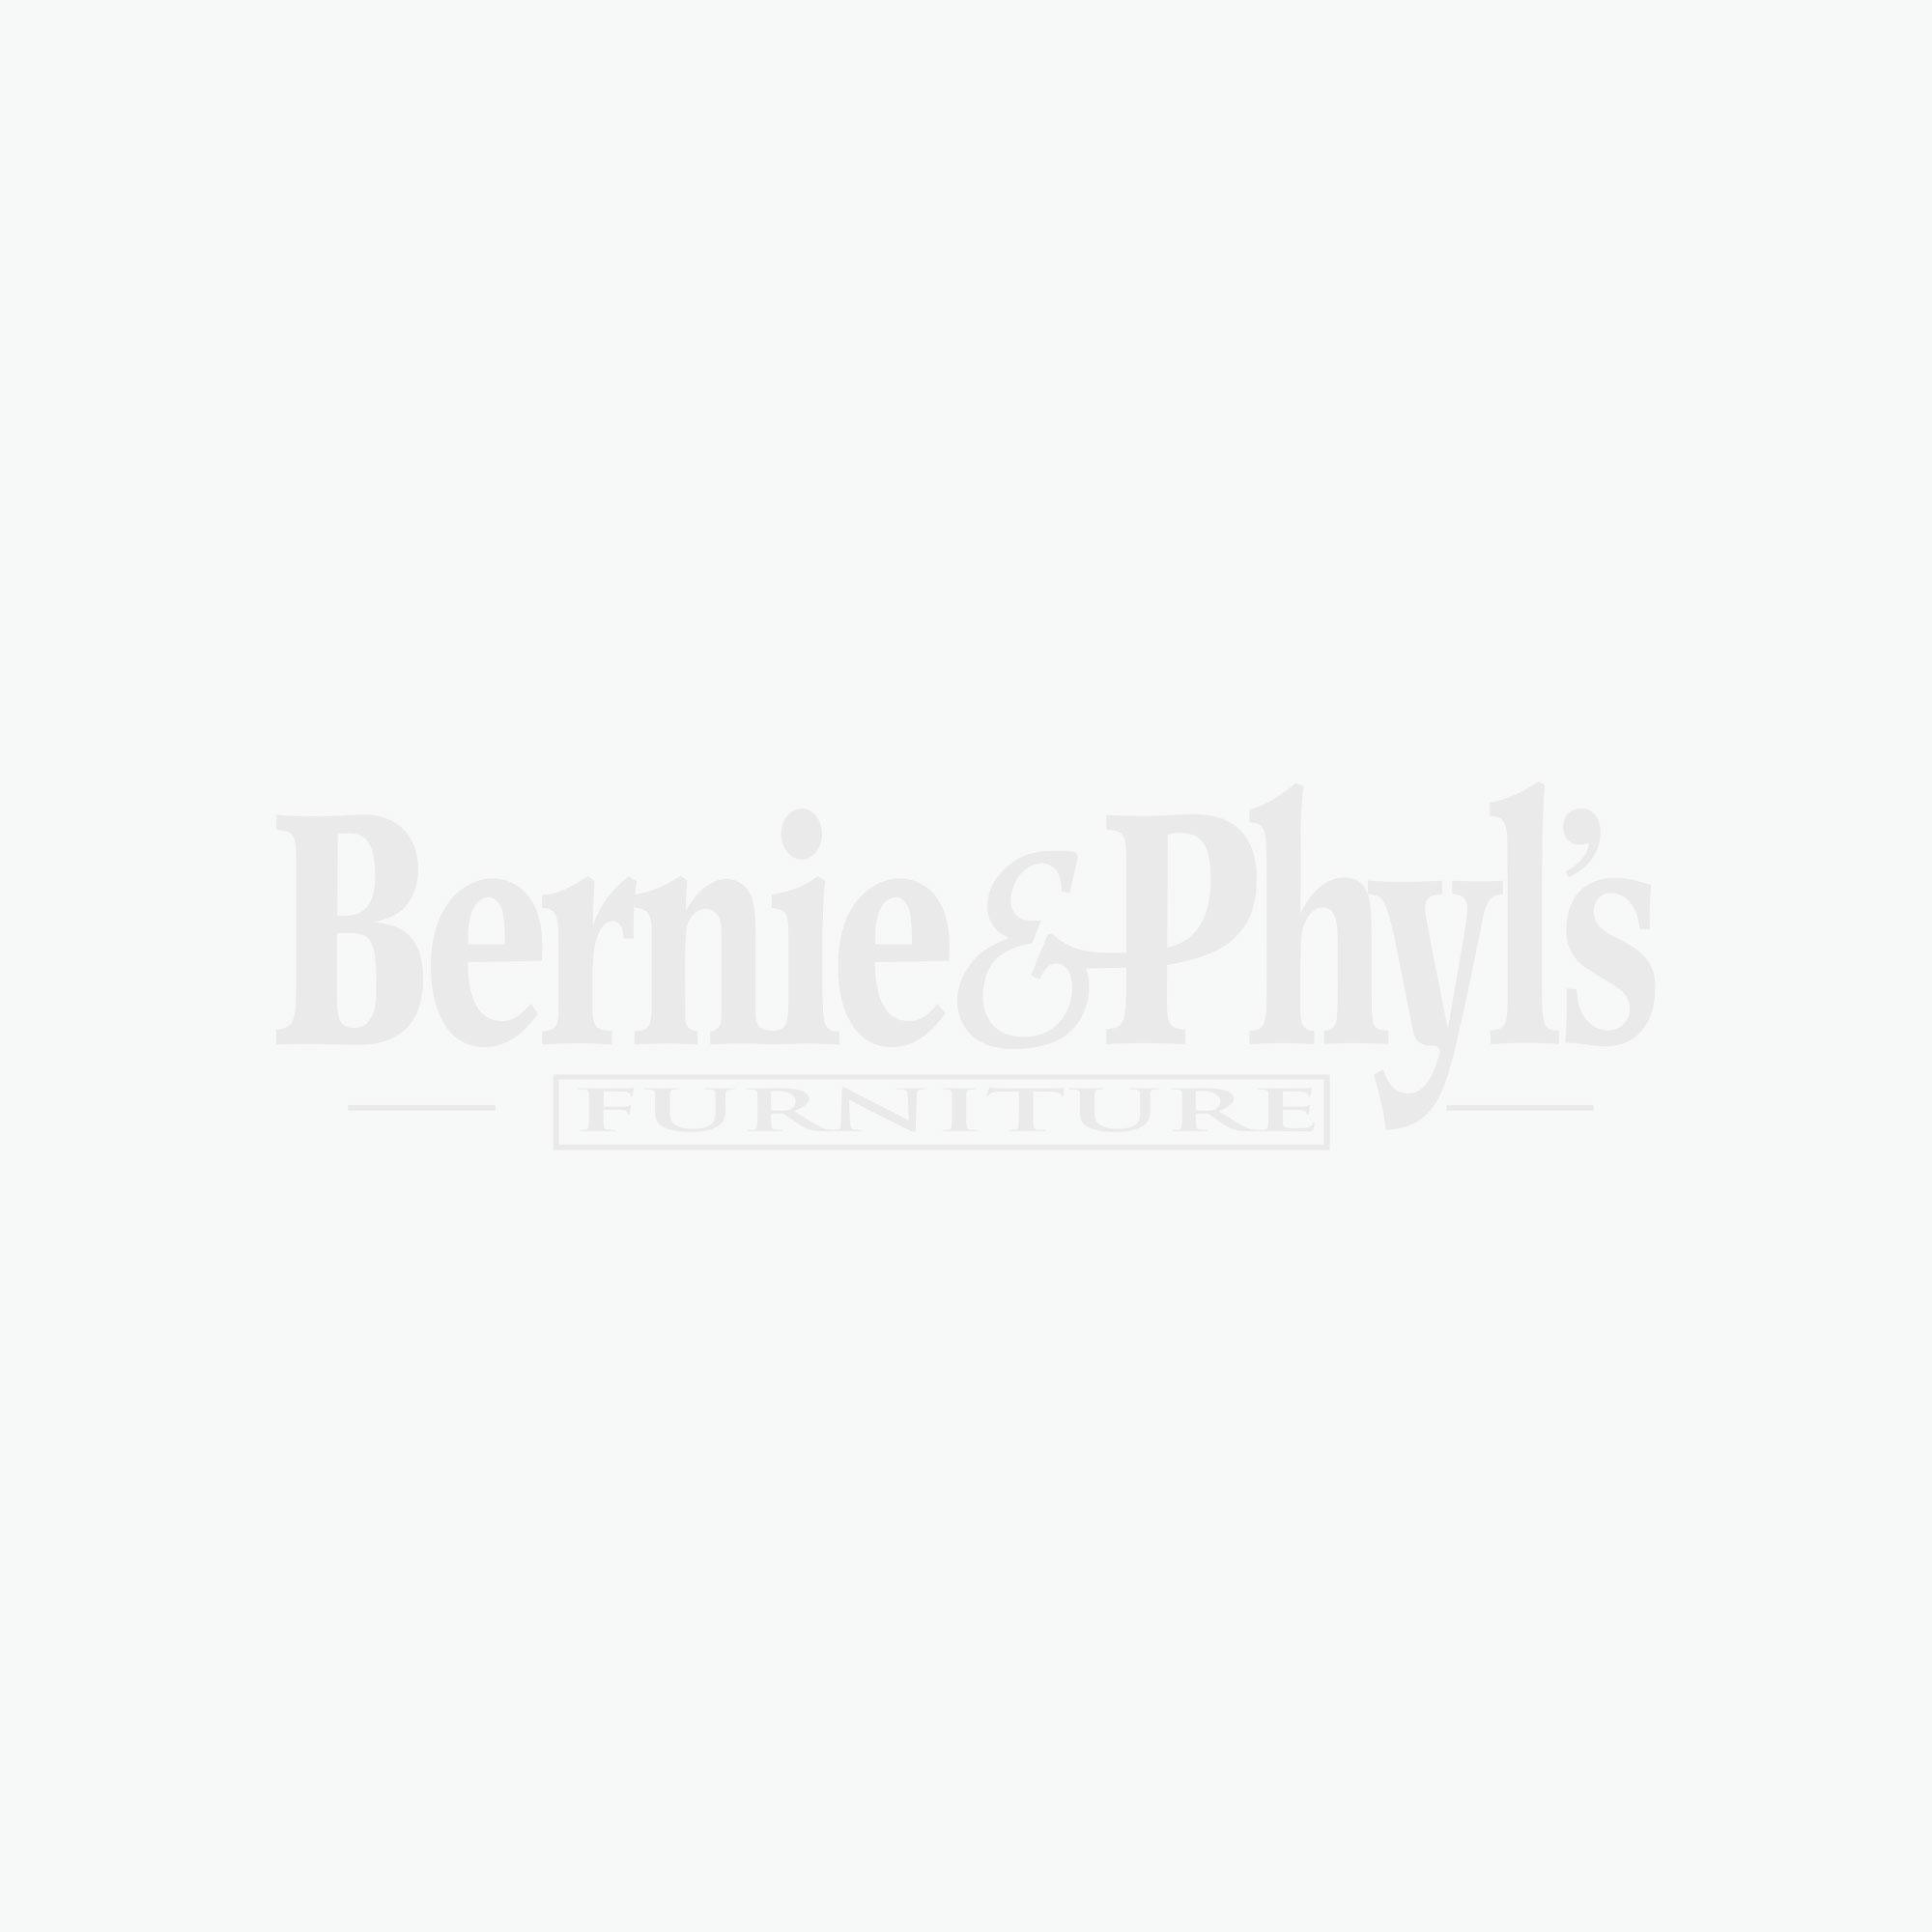 TempurPedic Supreme Breeze Flex Hybrid Mattress